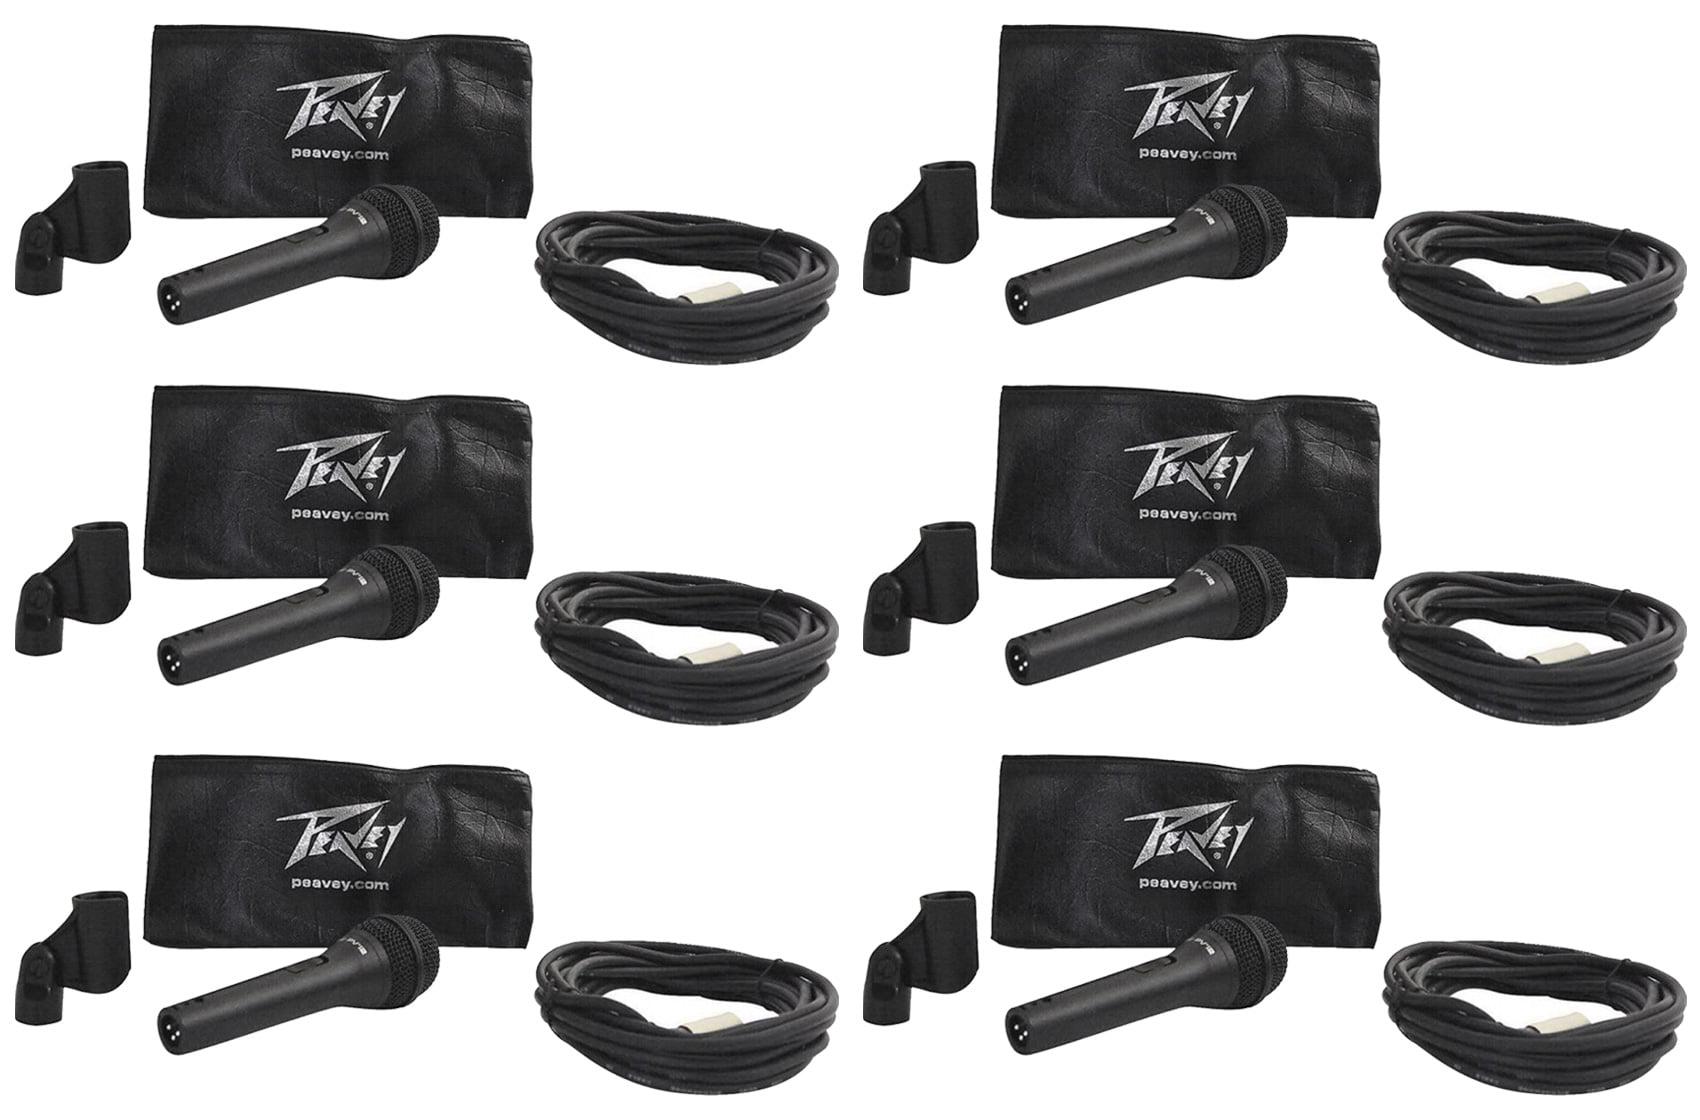 (6) Peavey PVI-2 XLR Steel Die Cast Vocal Microphones, Cardioid, Dynamic PVI2XLR by Peavey